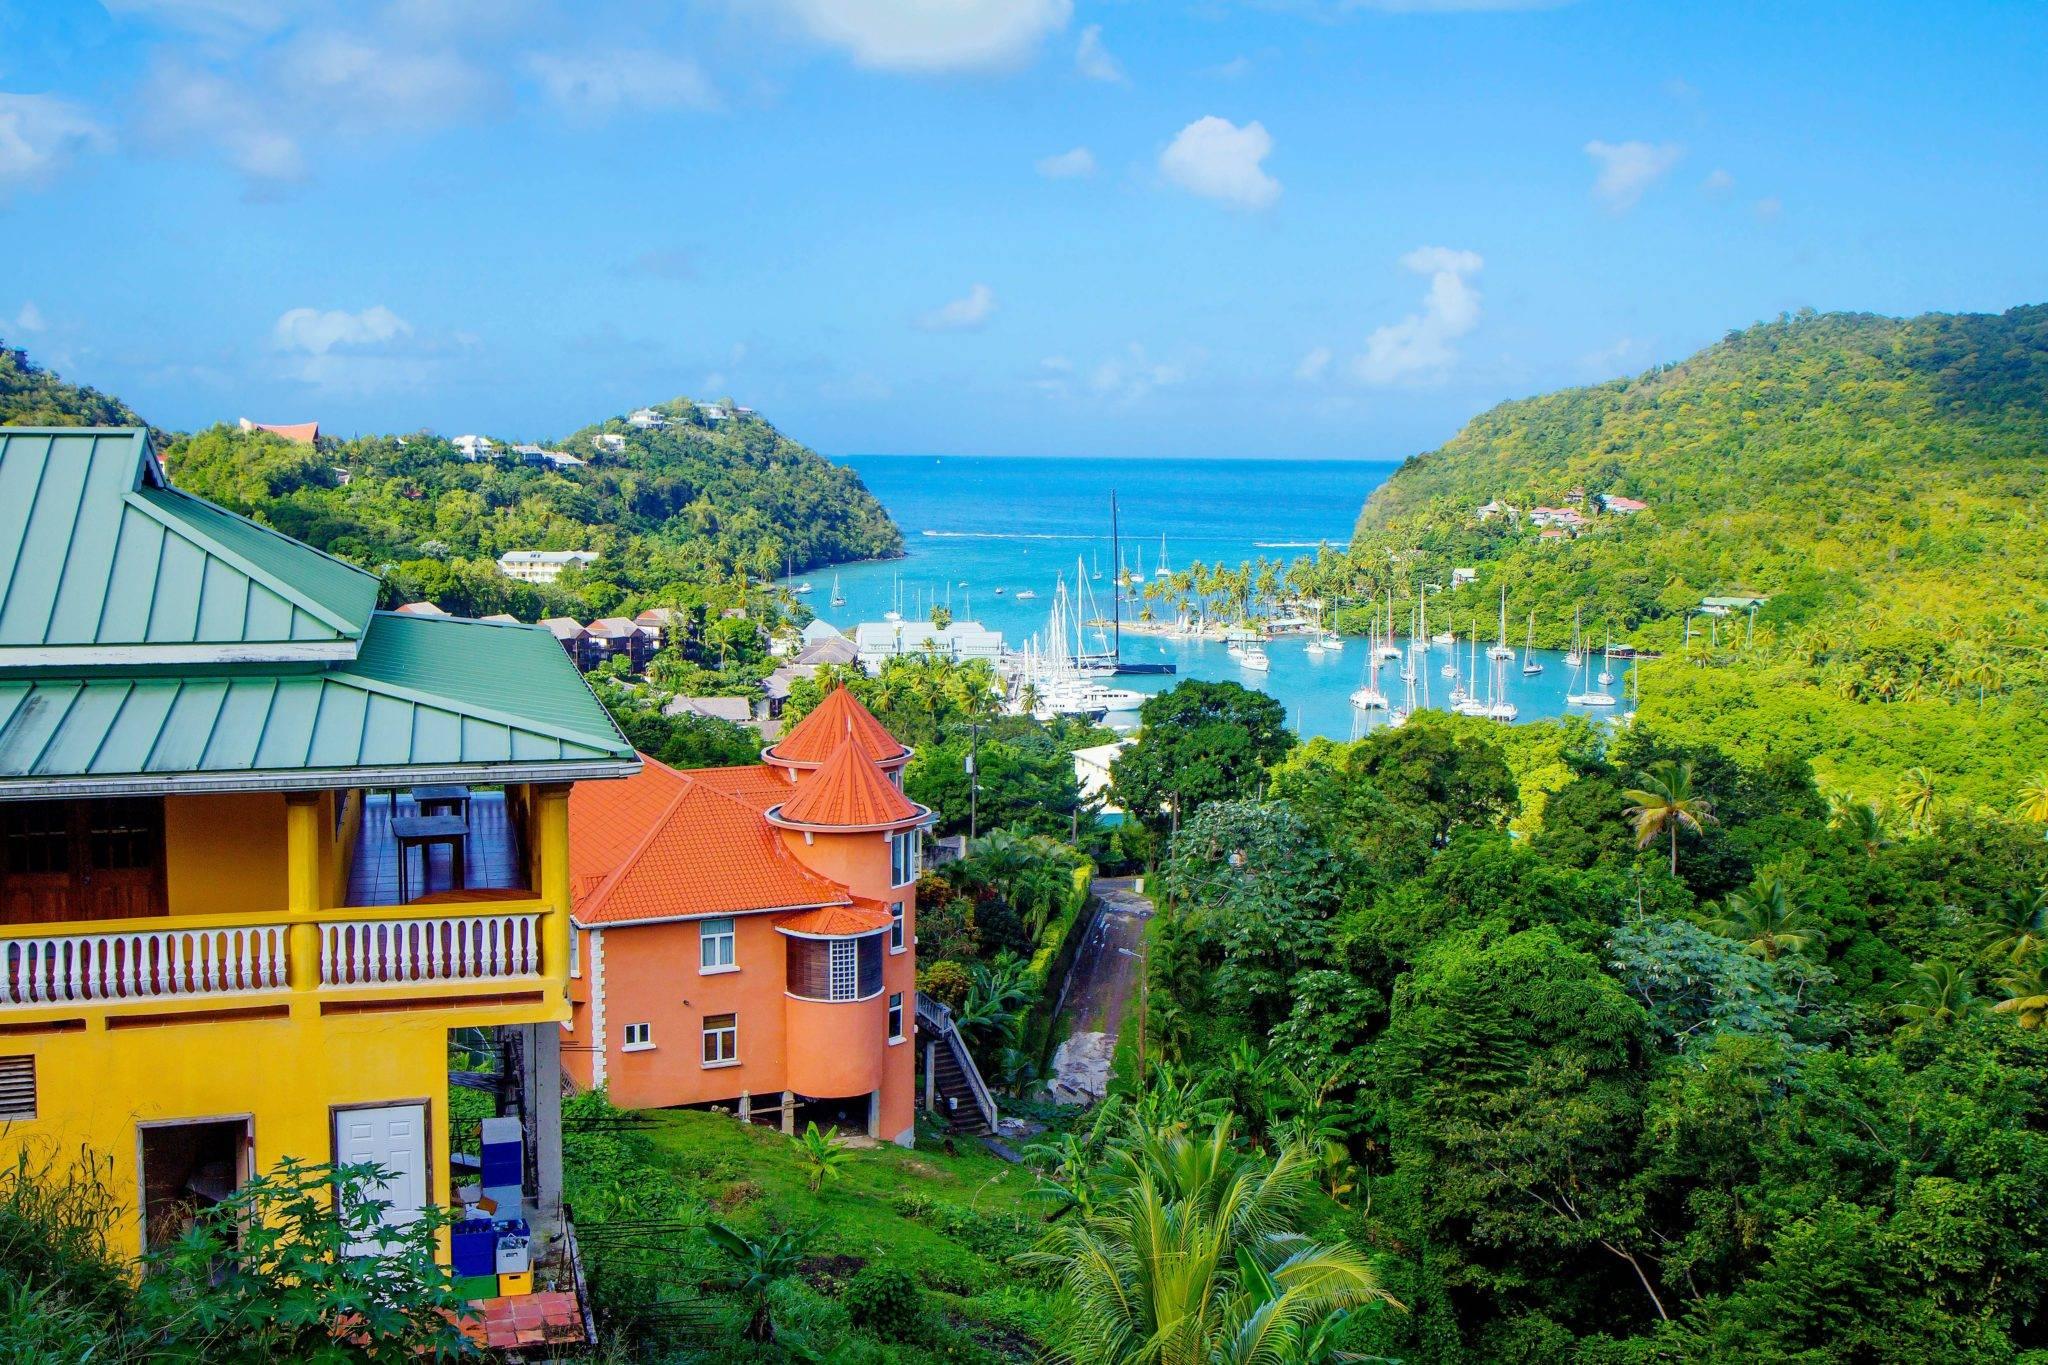 Camp Caribbean St. Lucia - Camp Caribbean